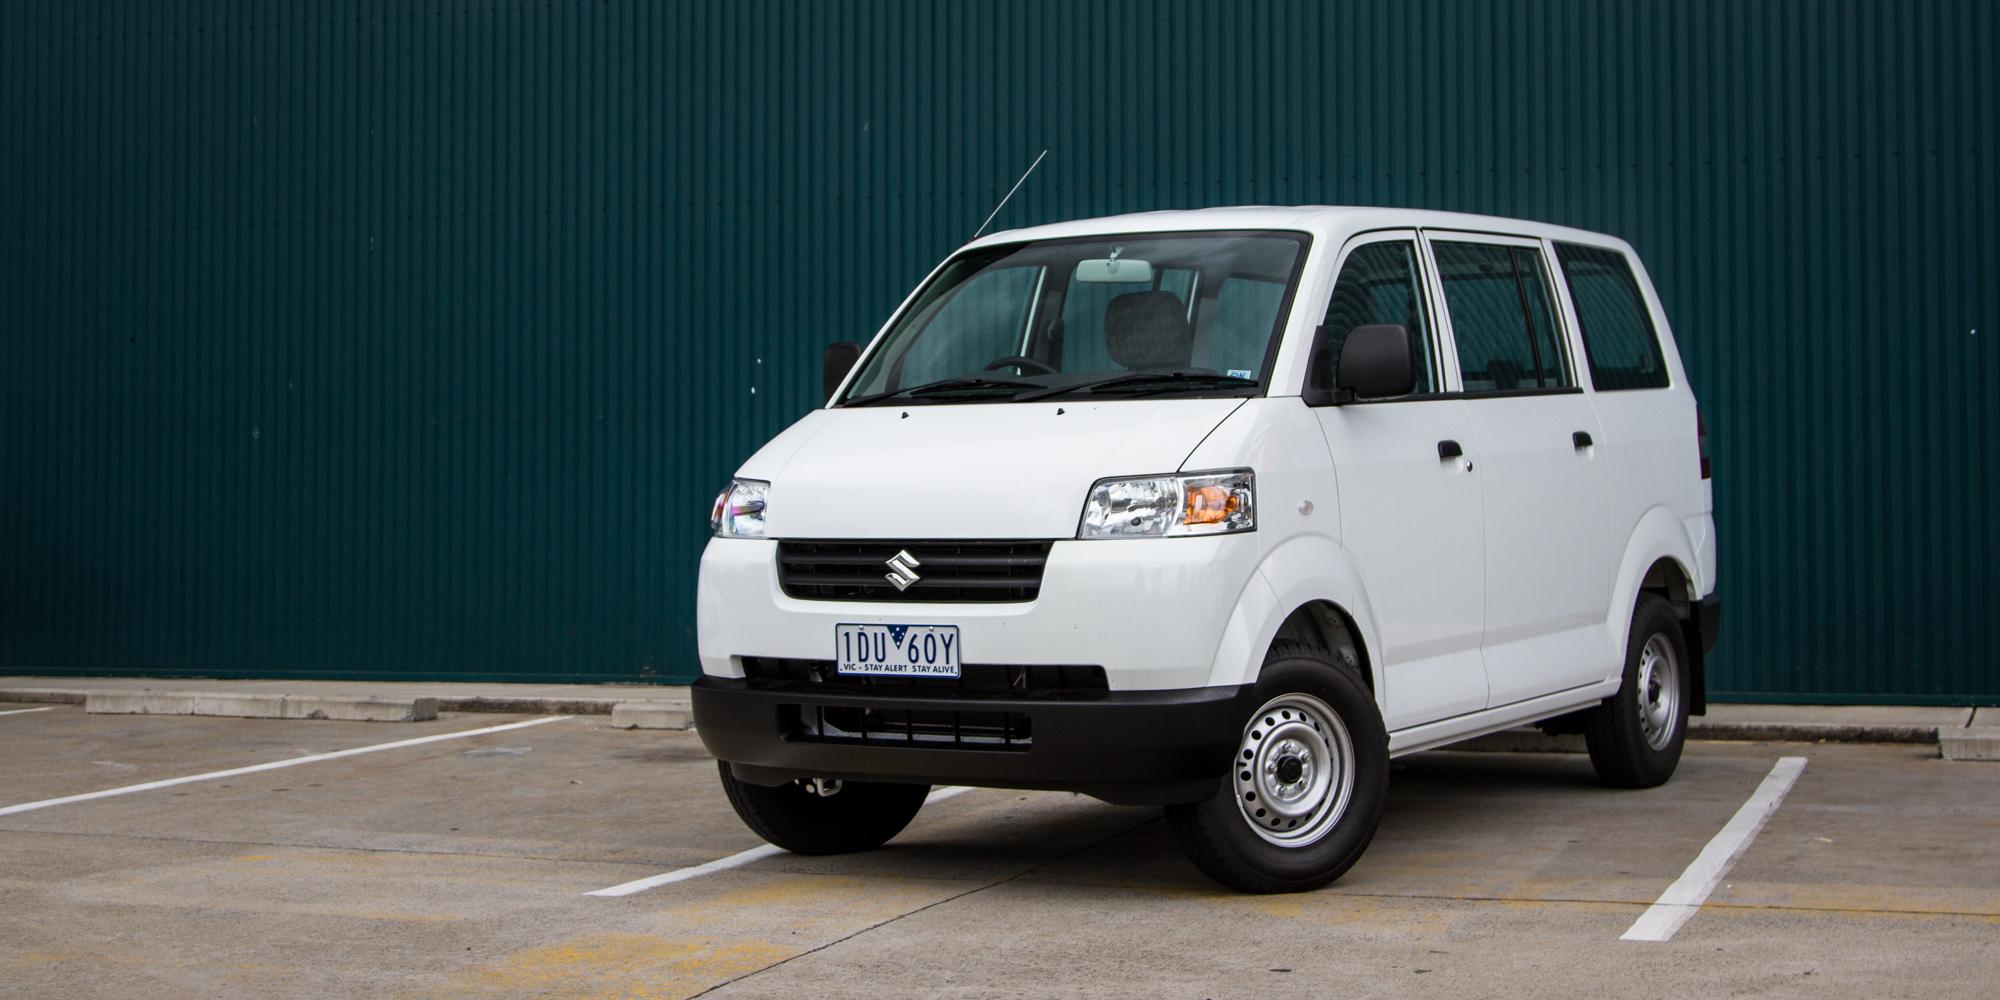 Suzuki Apv Van Single Review on 2015 Hyundai Sonata